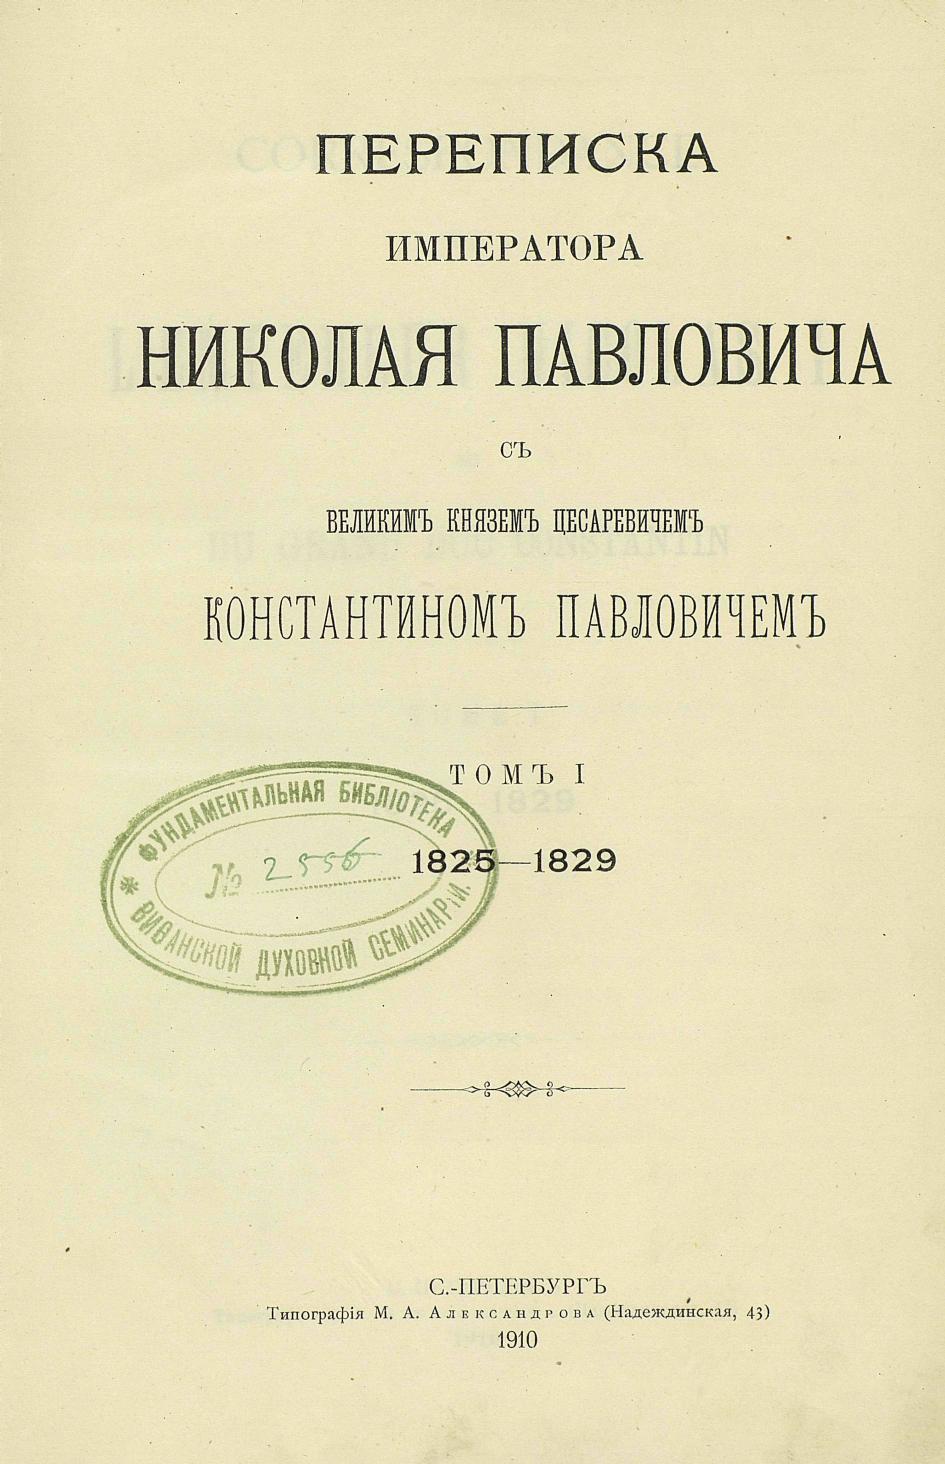 http://dlib.rsl.ru/viewer/pdf?docId=01004230188&page=4